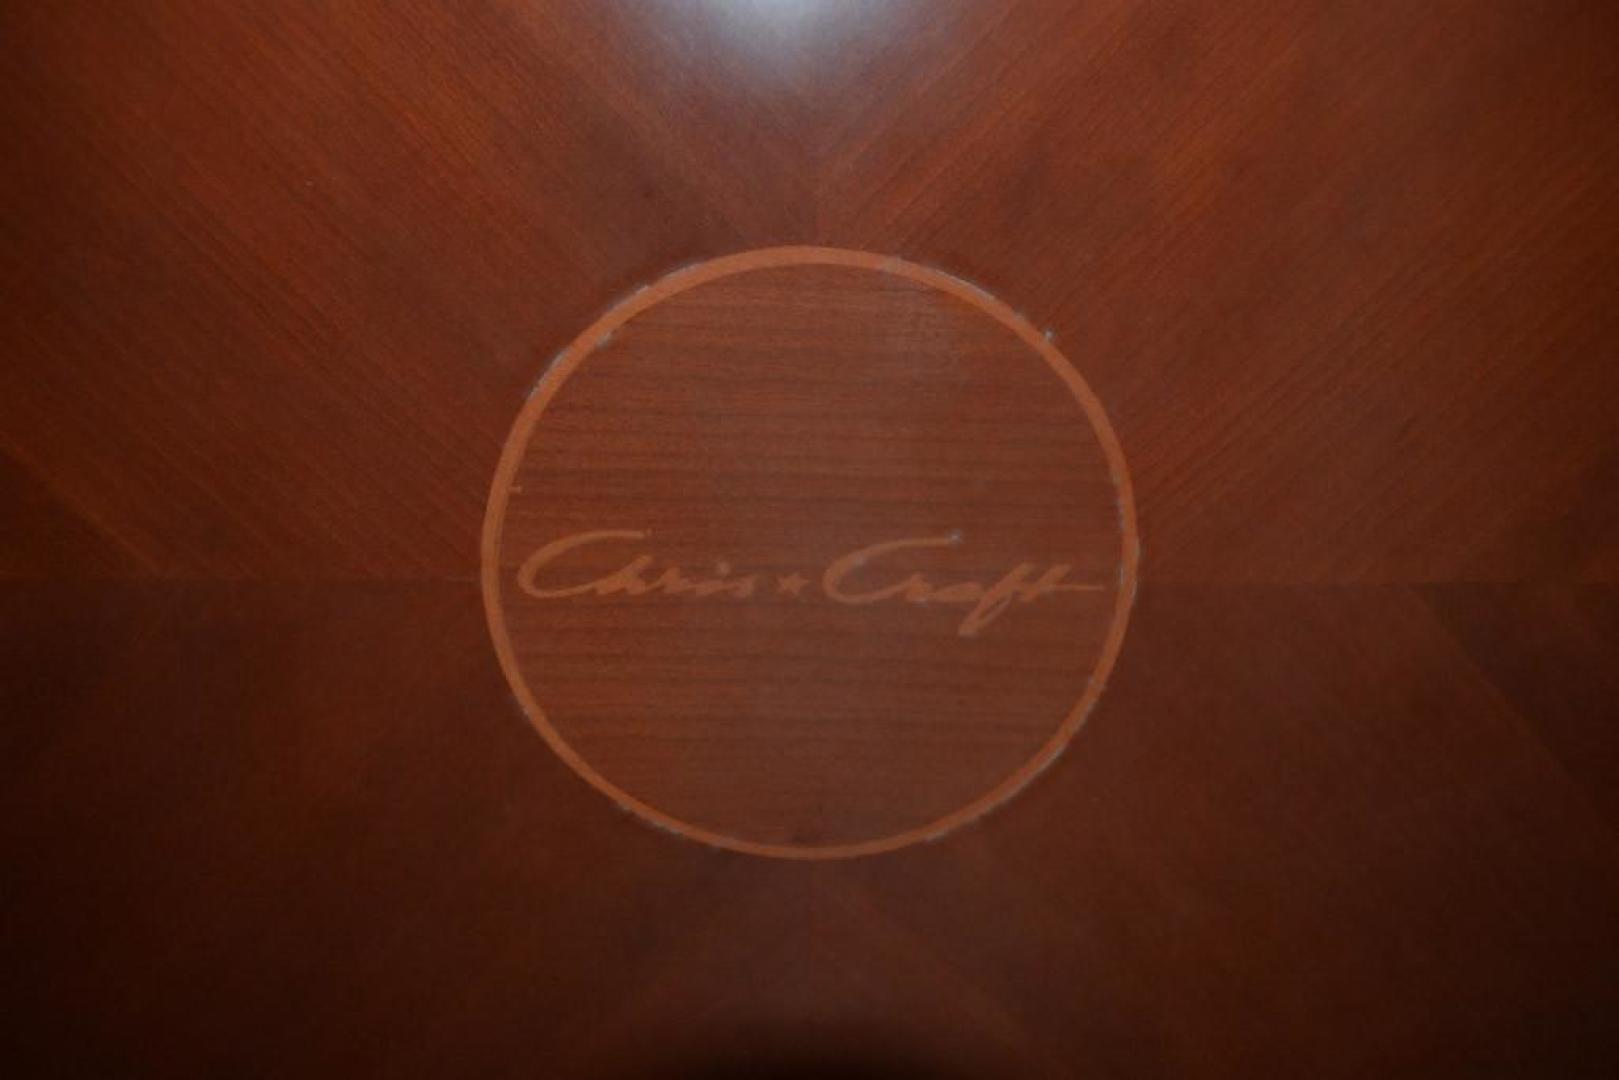 Chris-Craft-Roamer 2003-Lady Fairbanks Merritt Island-Florida-United States-Chris Craft Logo-924496   Thumbnail